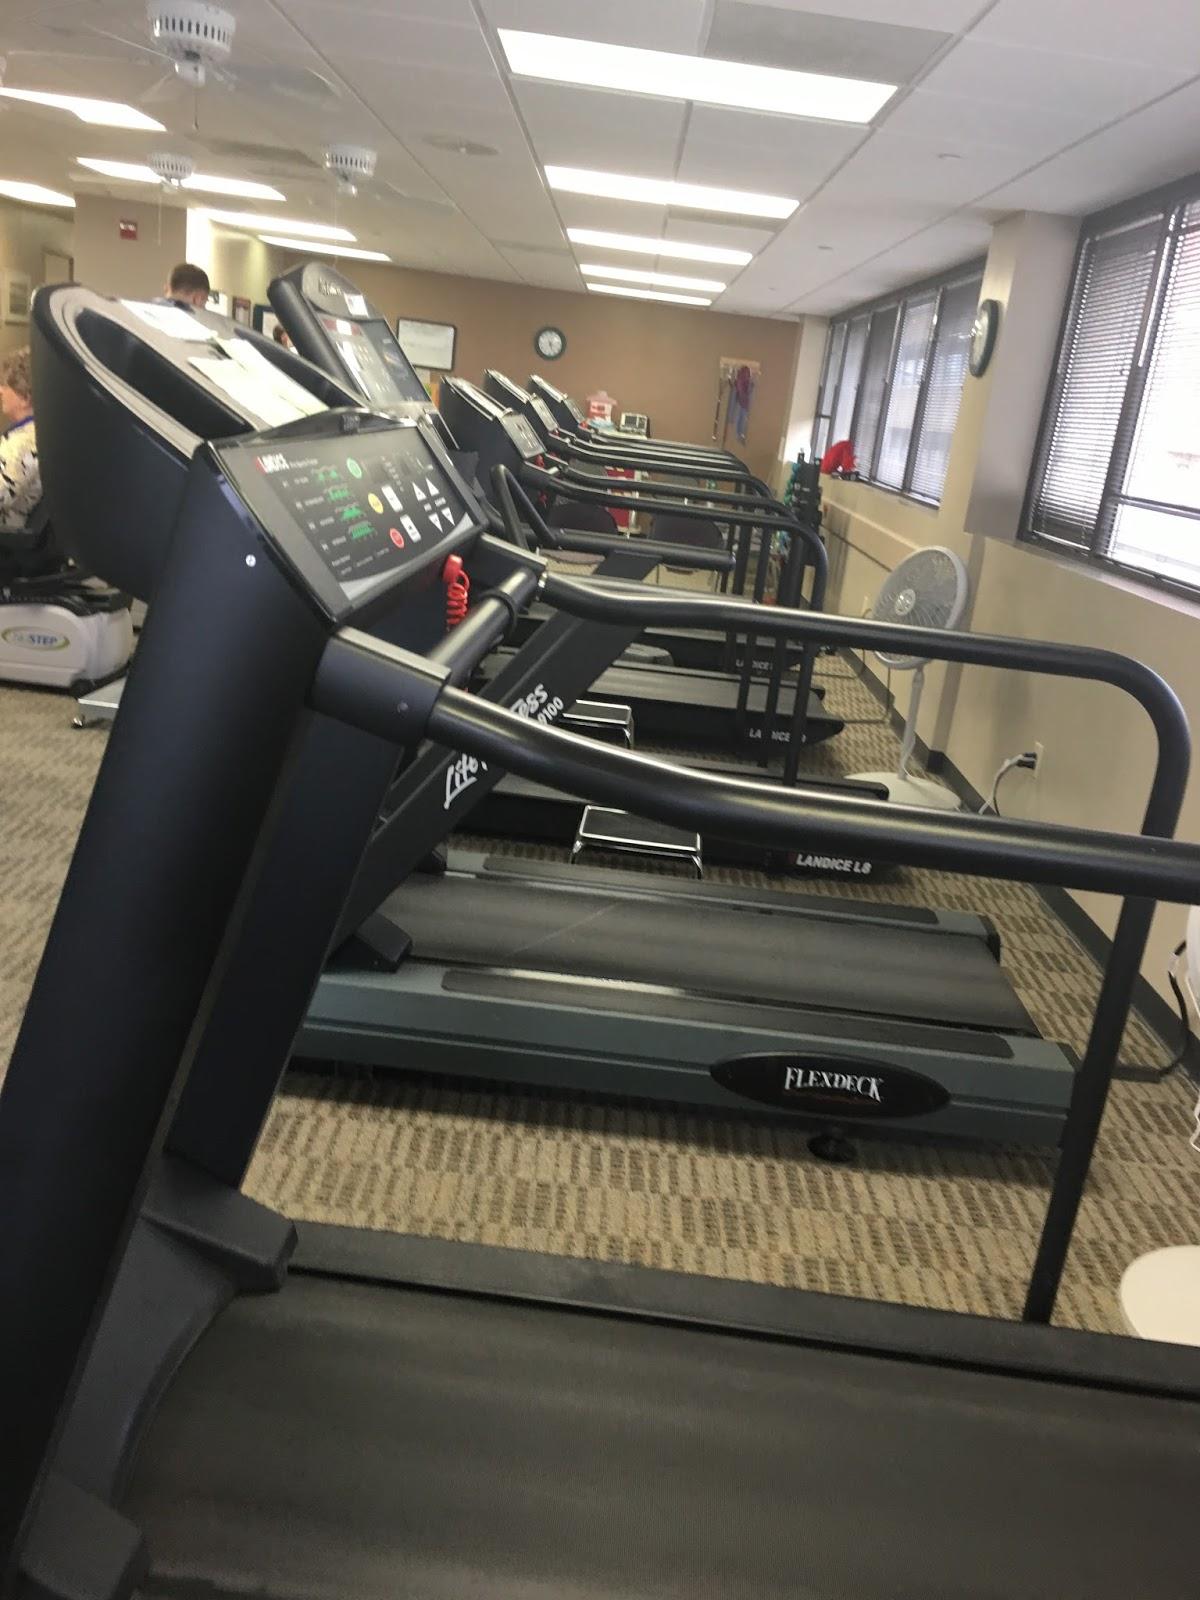 Bring on the treadmills!! I'm ready!